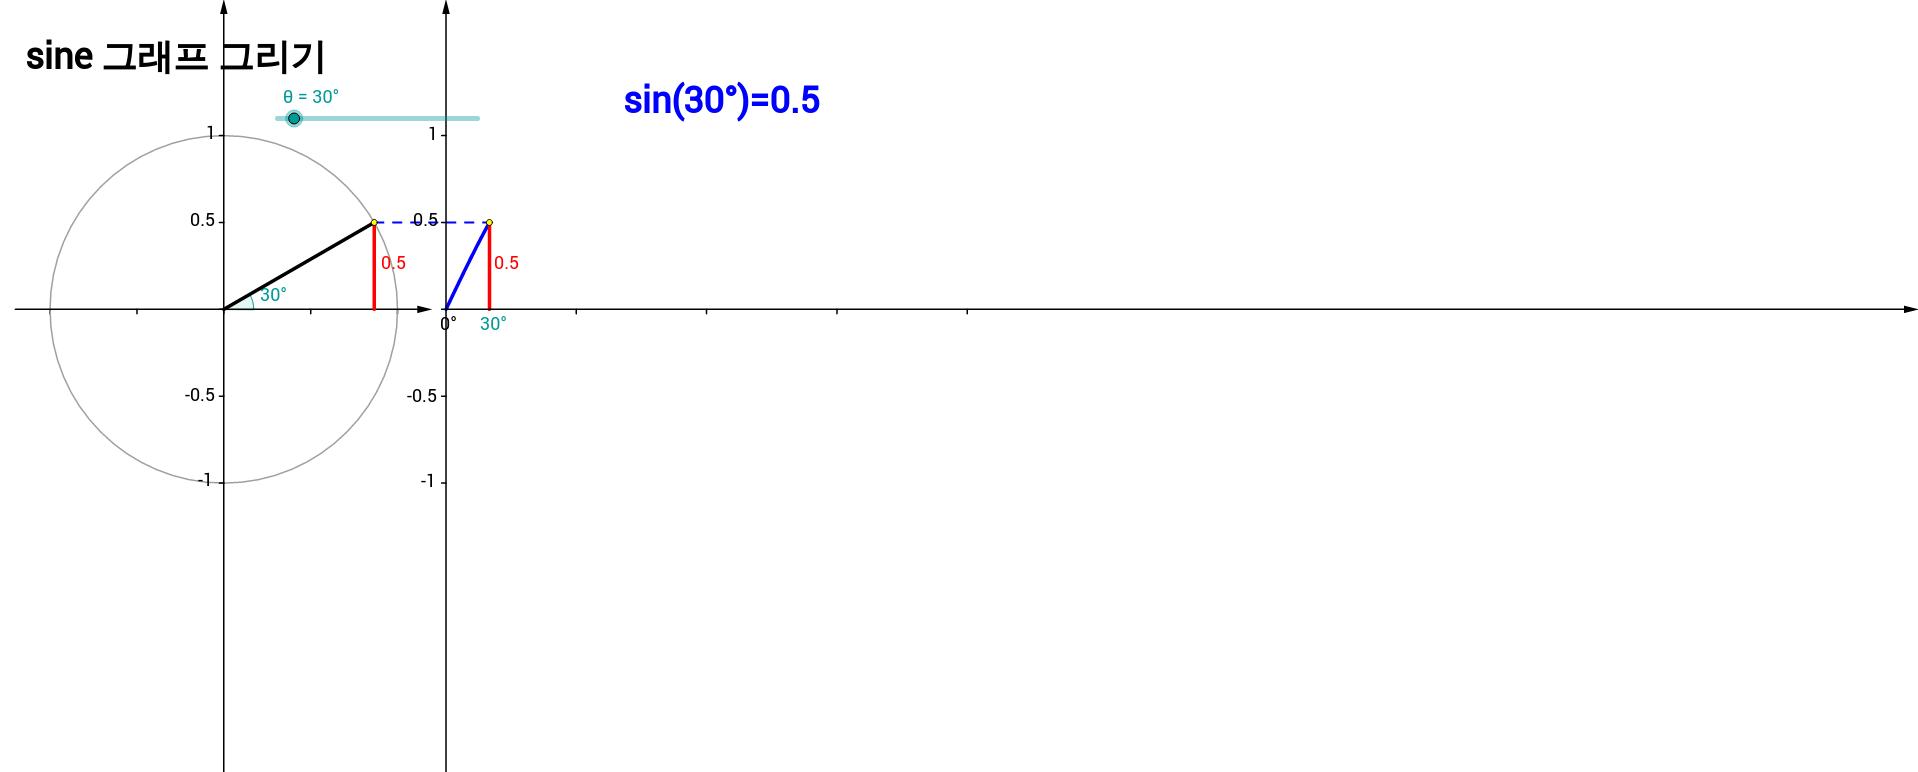 sine 그래프 그리기